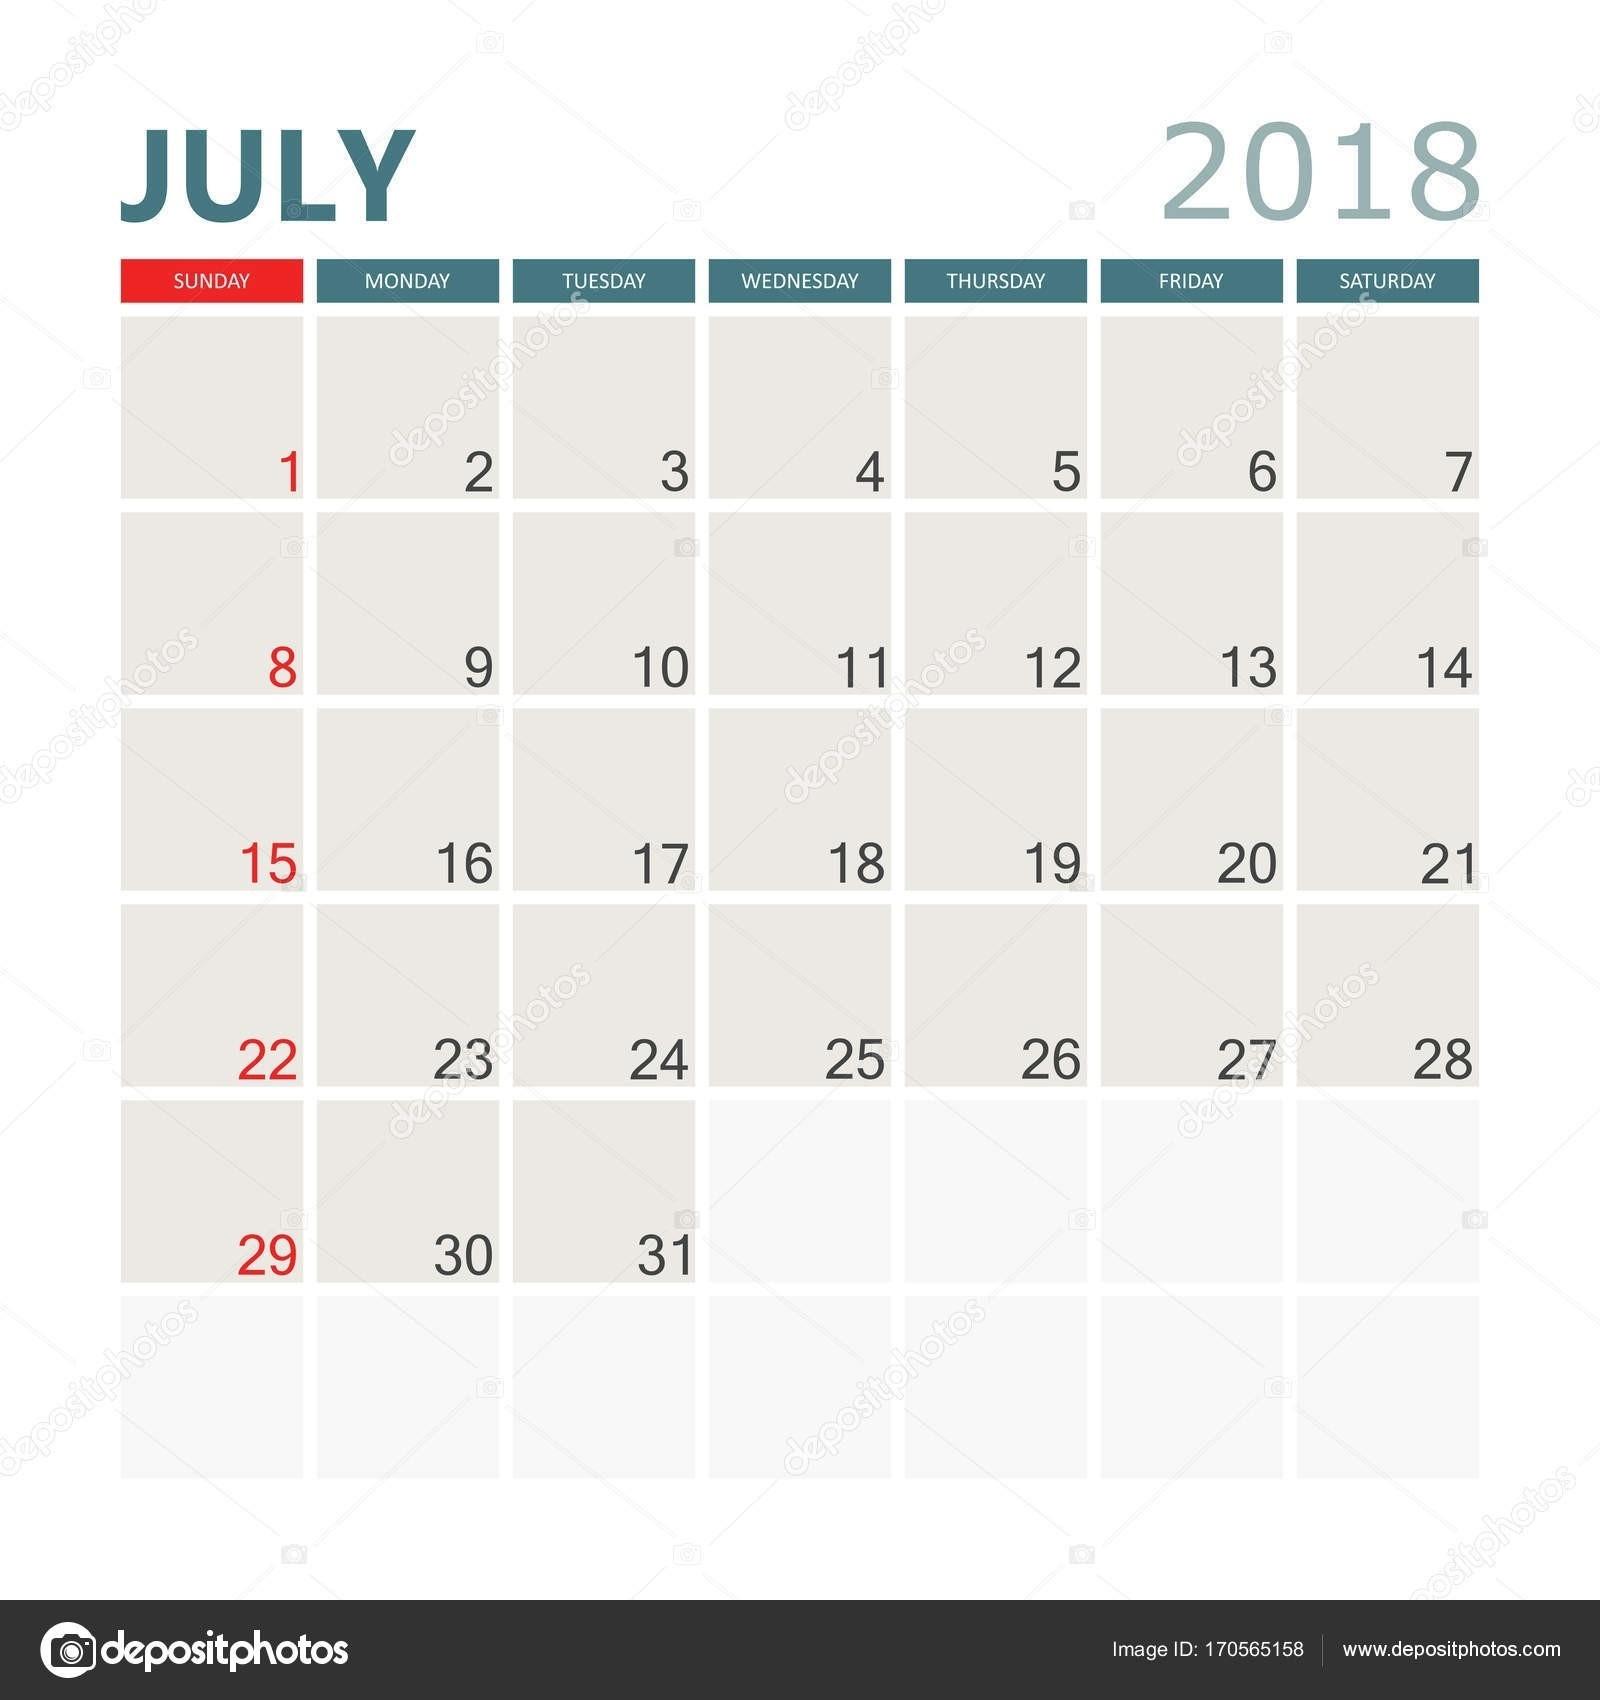 Depo Provera Calendar Pdf   Printable Calendar Template 2021